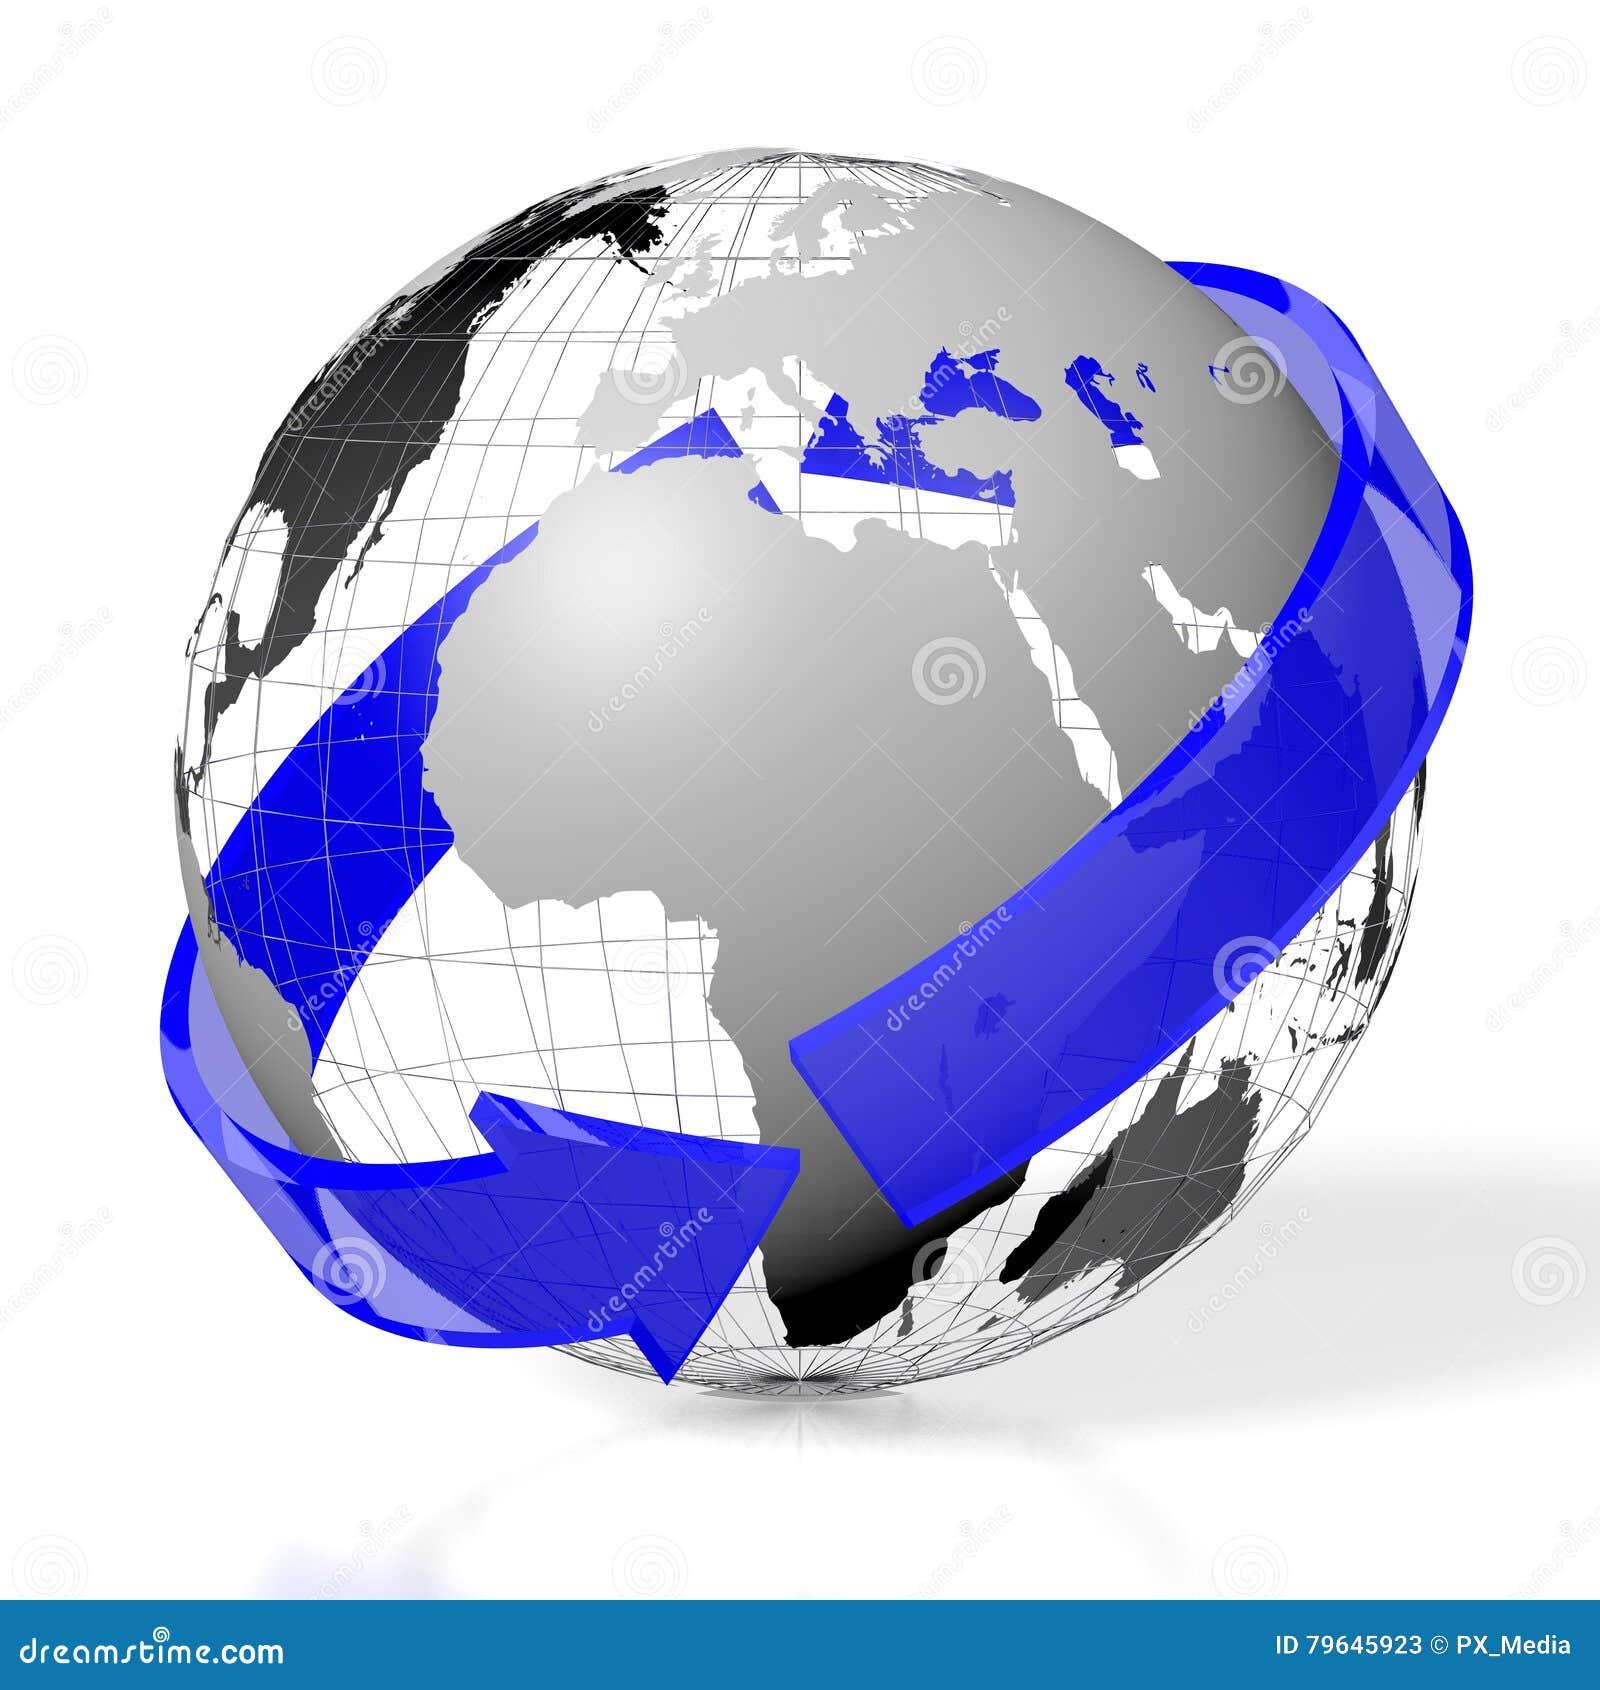 global business topics